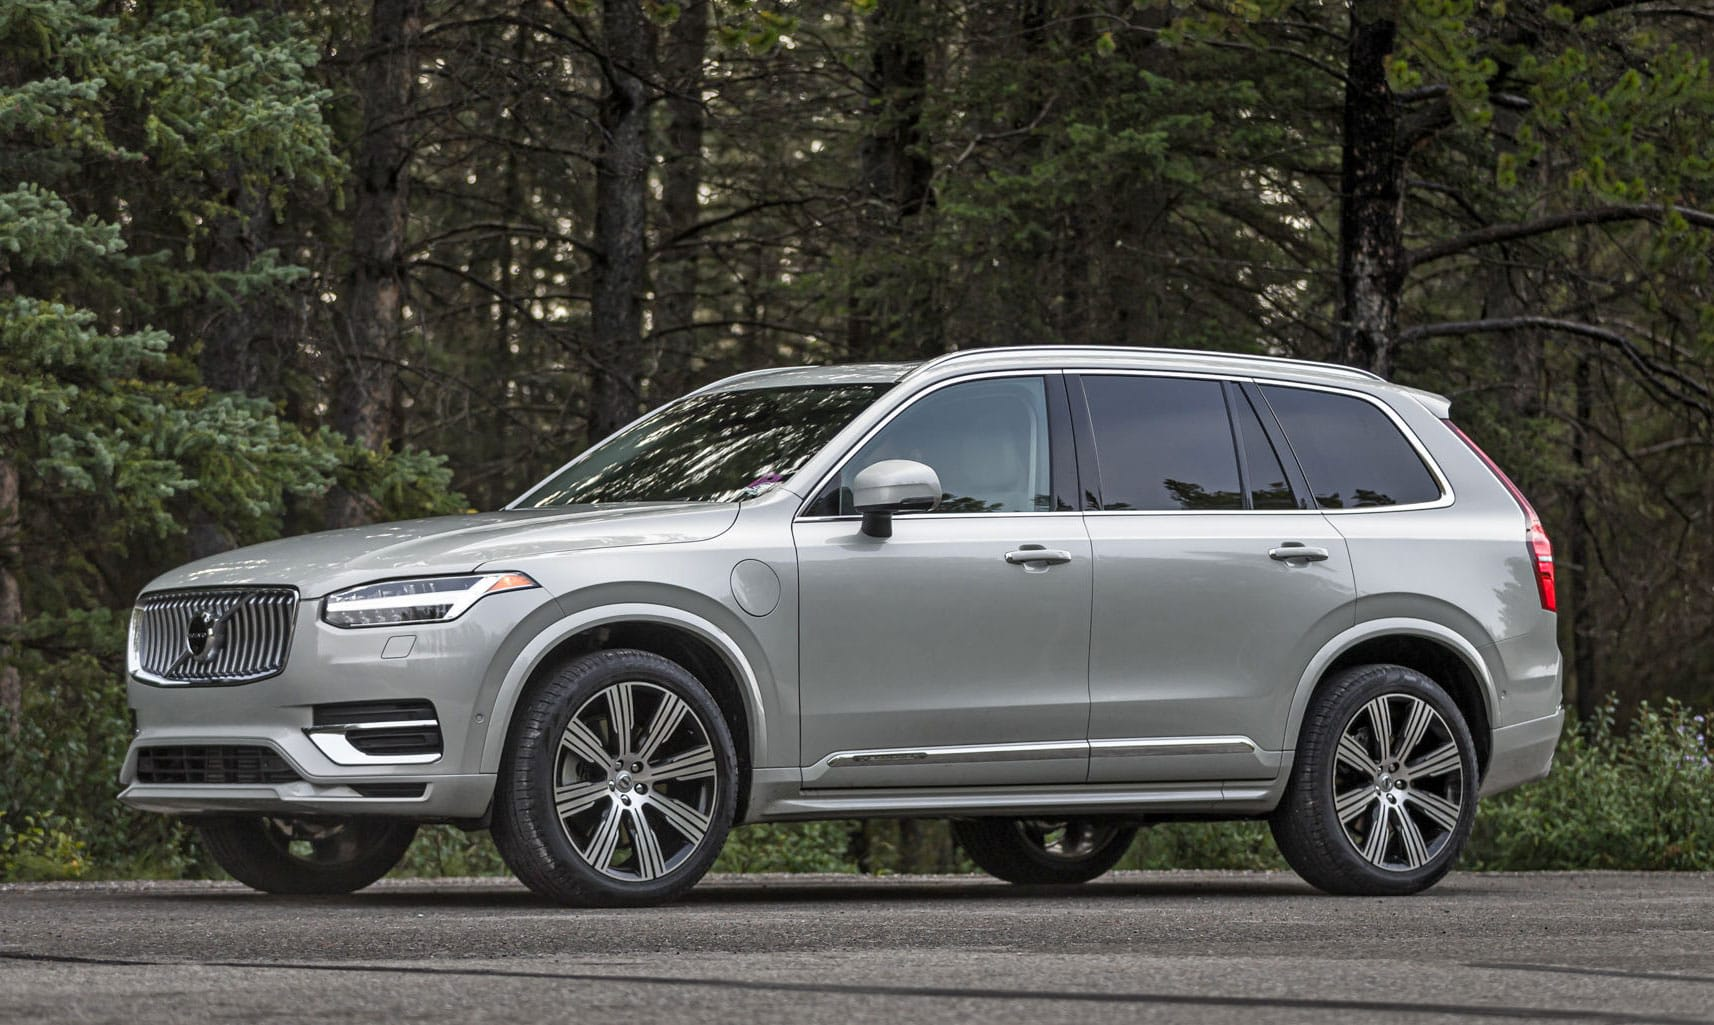 Volvo's XC90 brings Swedish minimalism to a sea of luxury SUVs